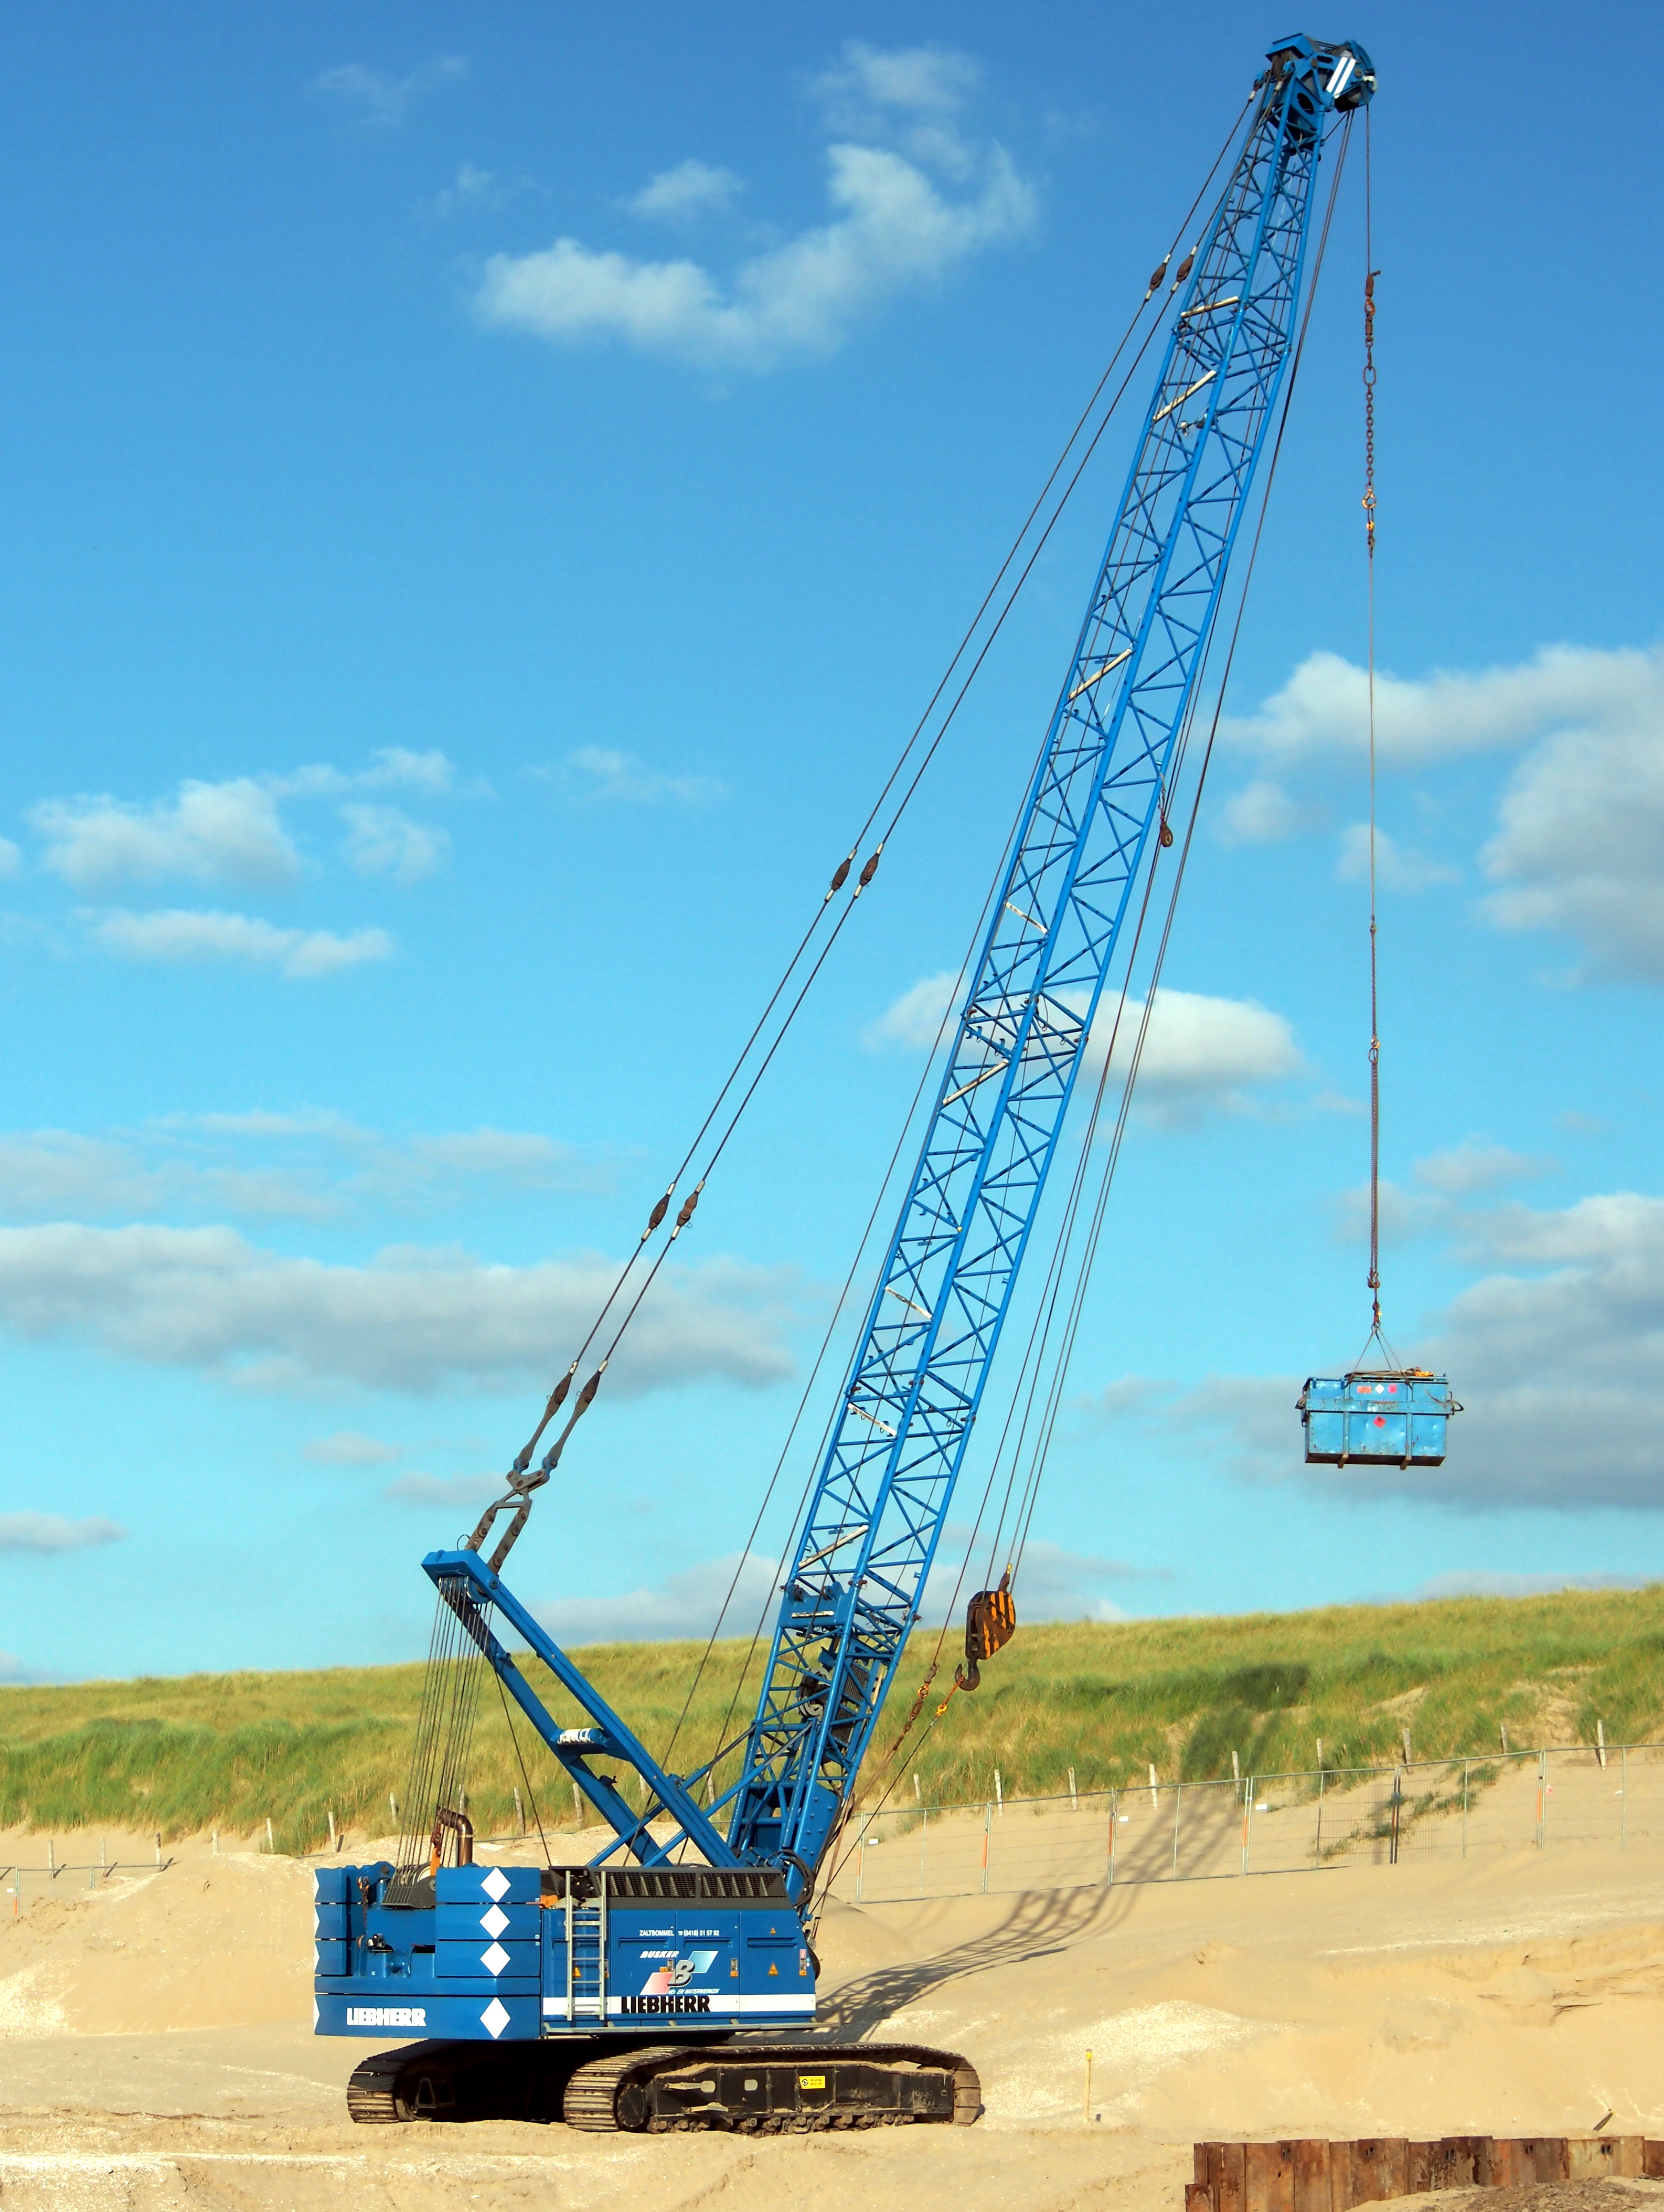 File:Liebherr crawler crane at Noordwijk beach, pic1 JPG